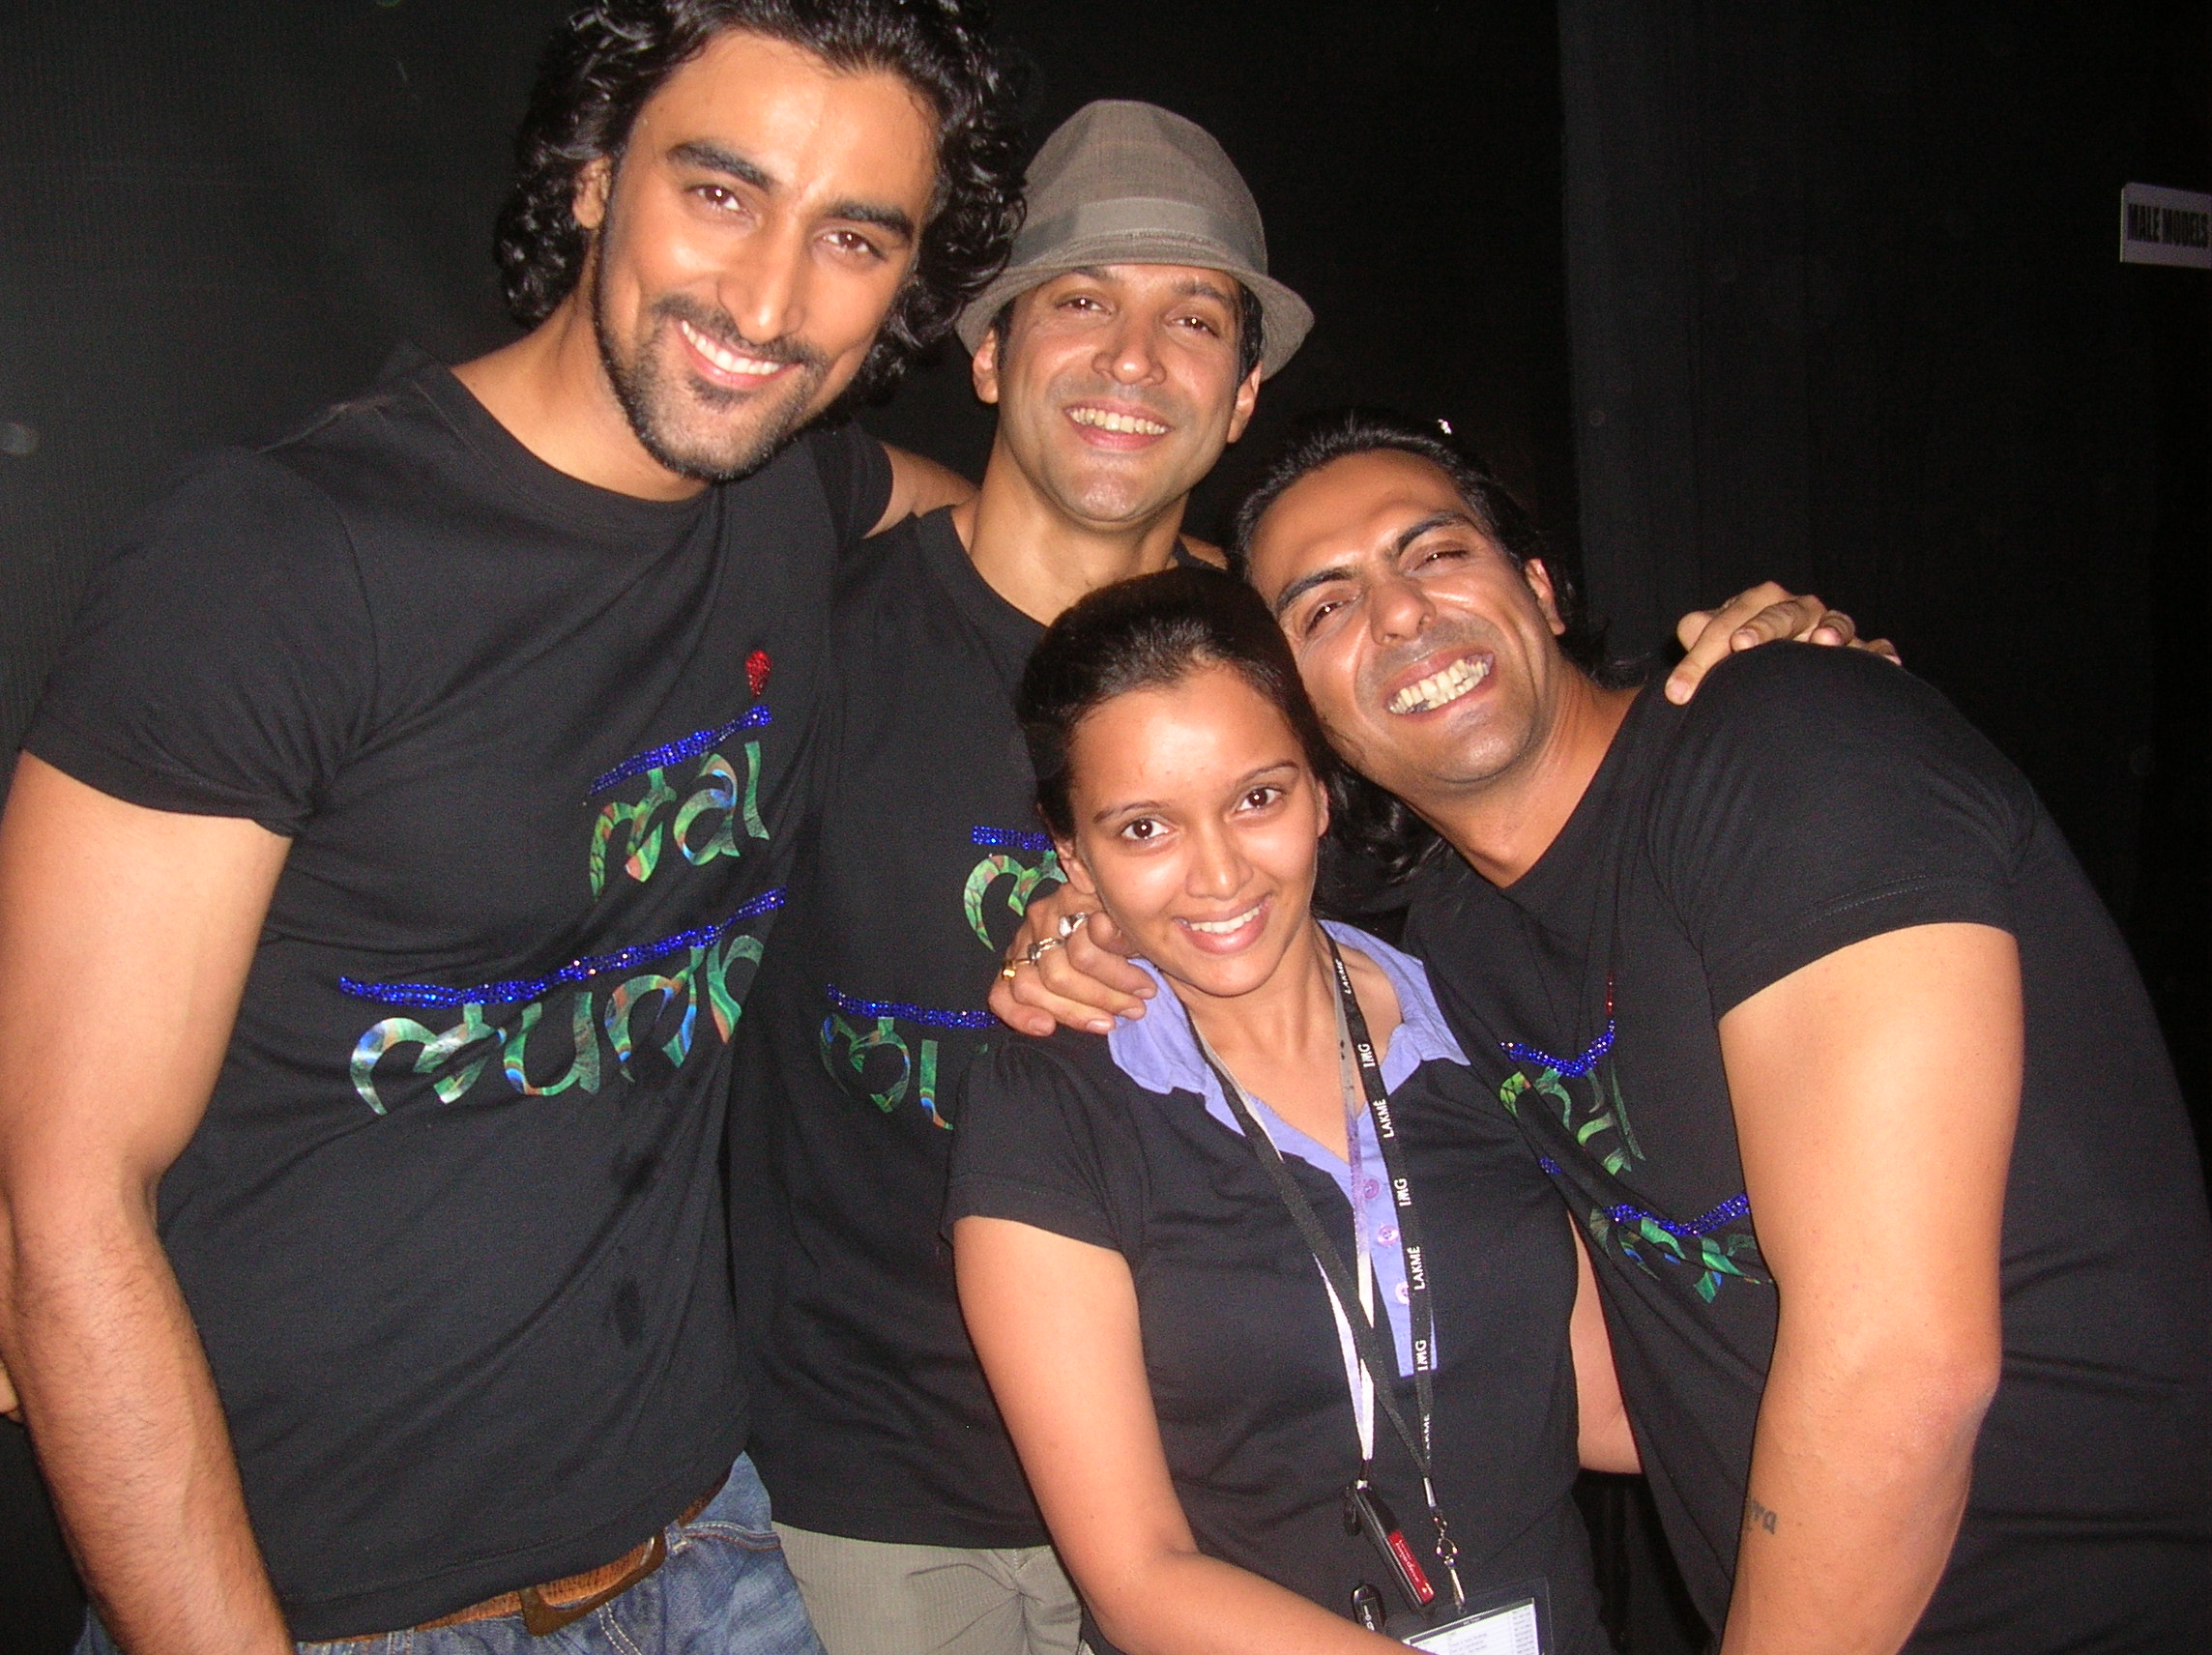 Kunal Roy Kapoor, Farhan Aktar and Arjun Rampal chilling backstage after the Mai Mumbai show